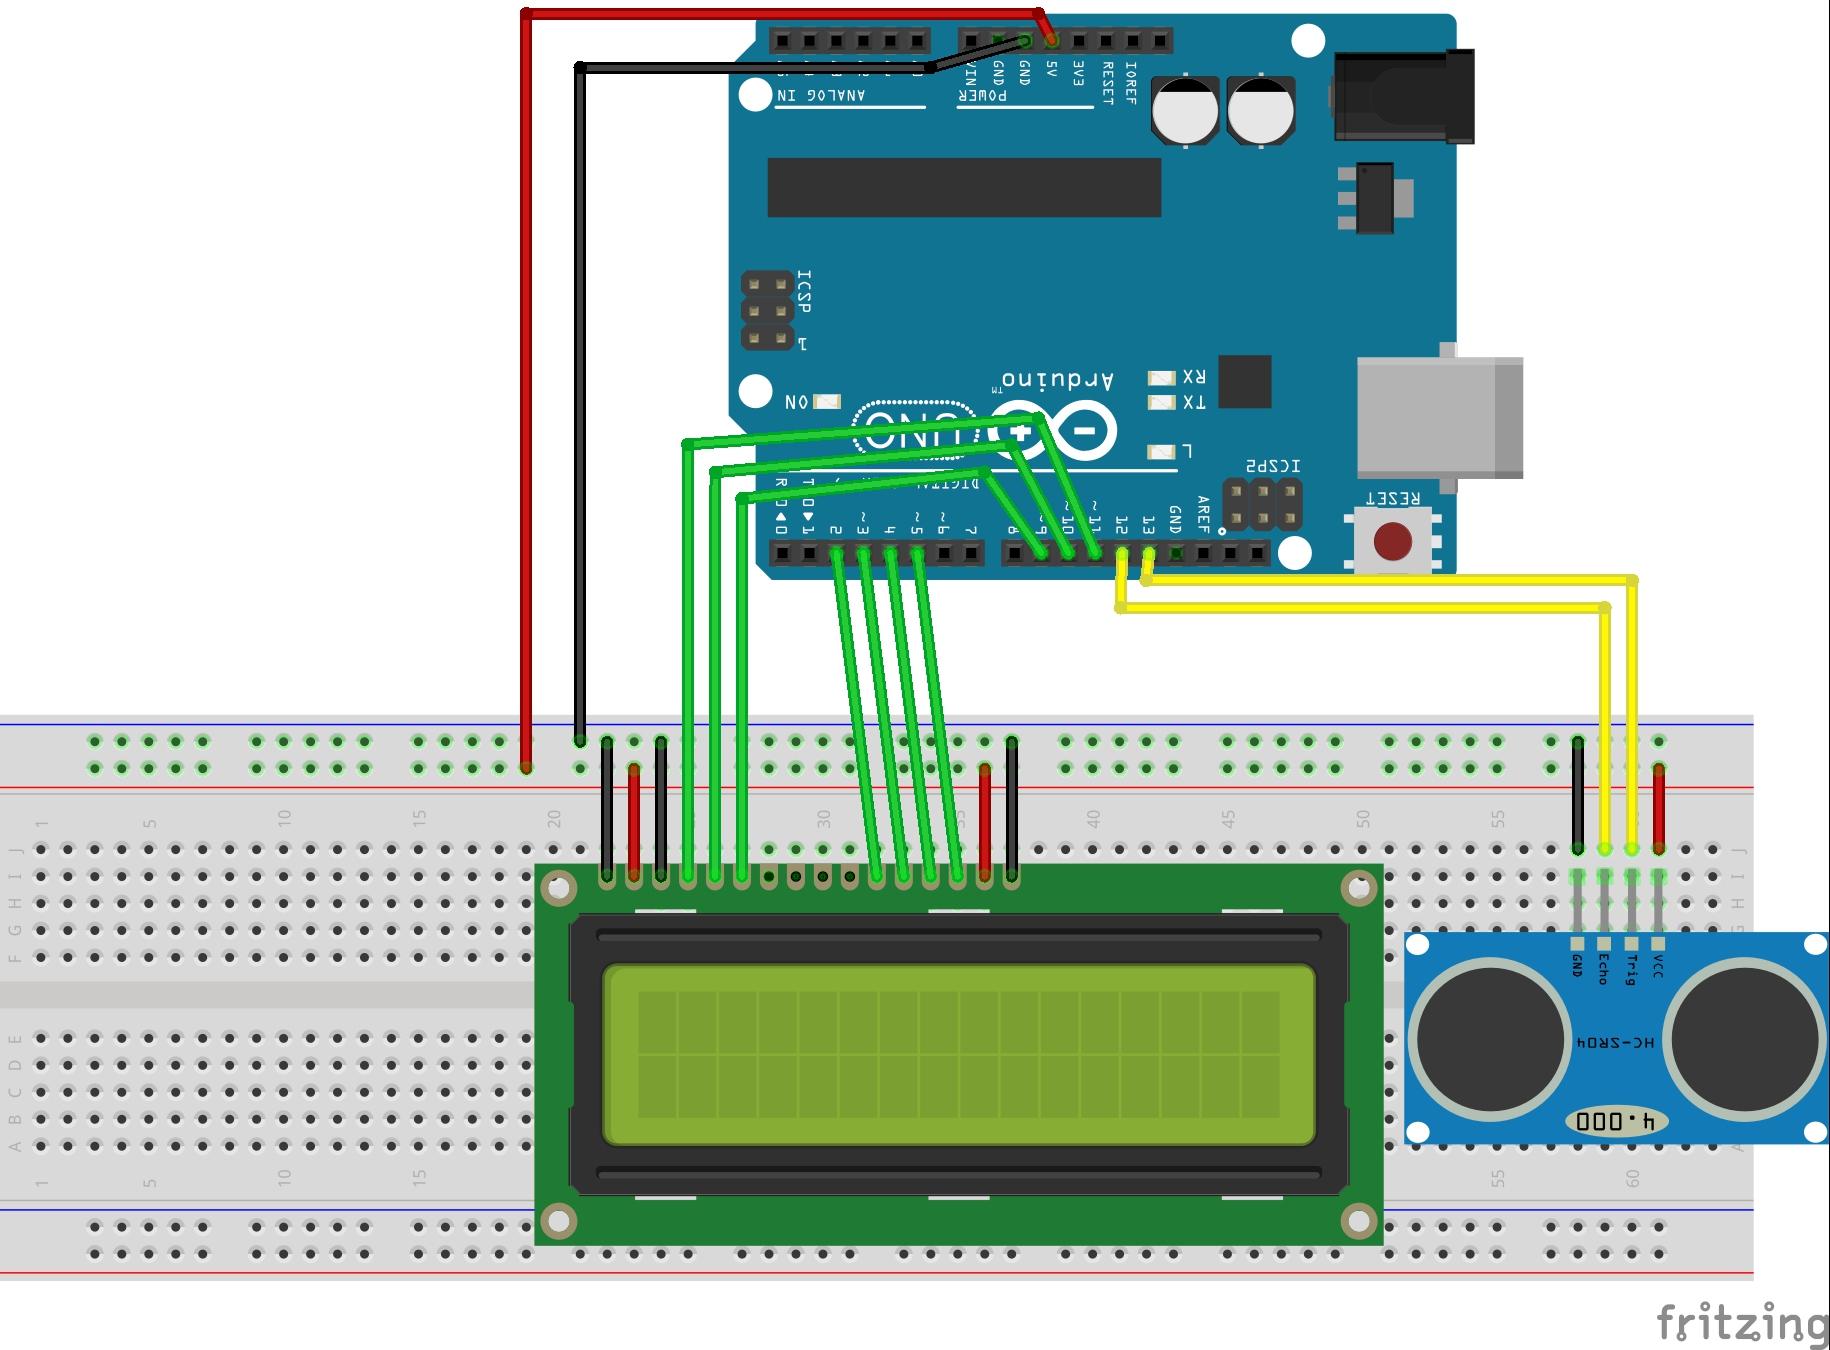 Projects using the Teensy USB development board